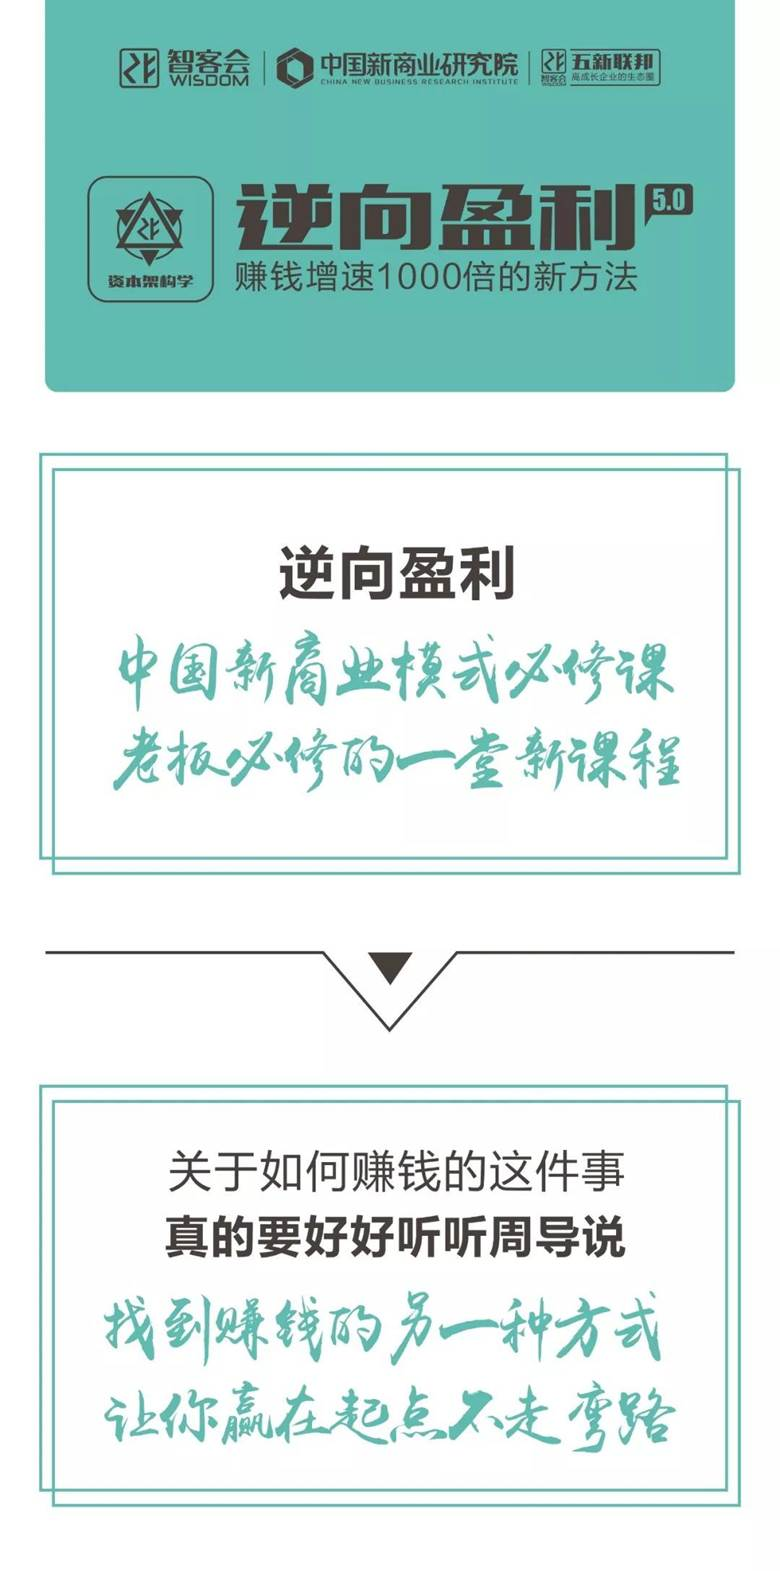 http://www.huodongxing.com/file/20191113/1063603644976/323659458993198.jpeg